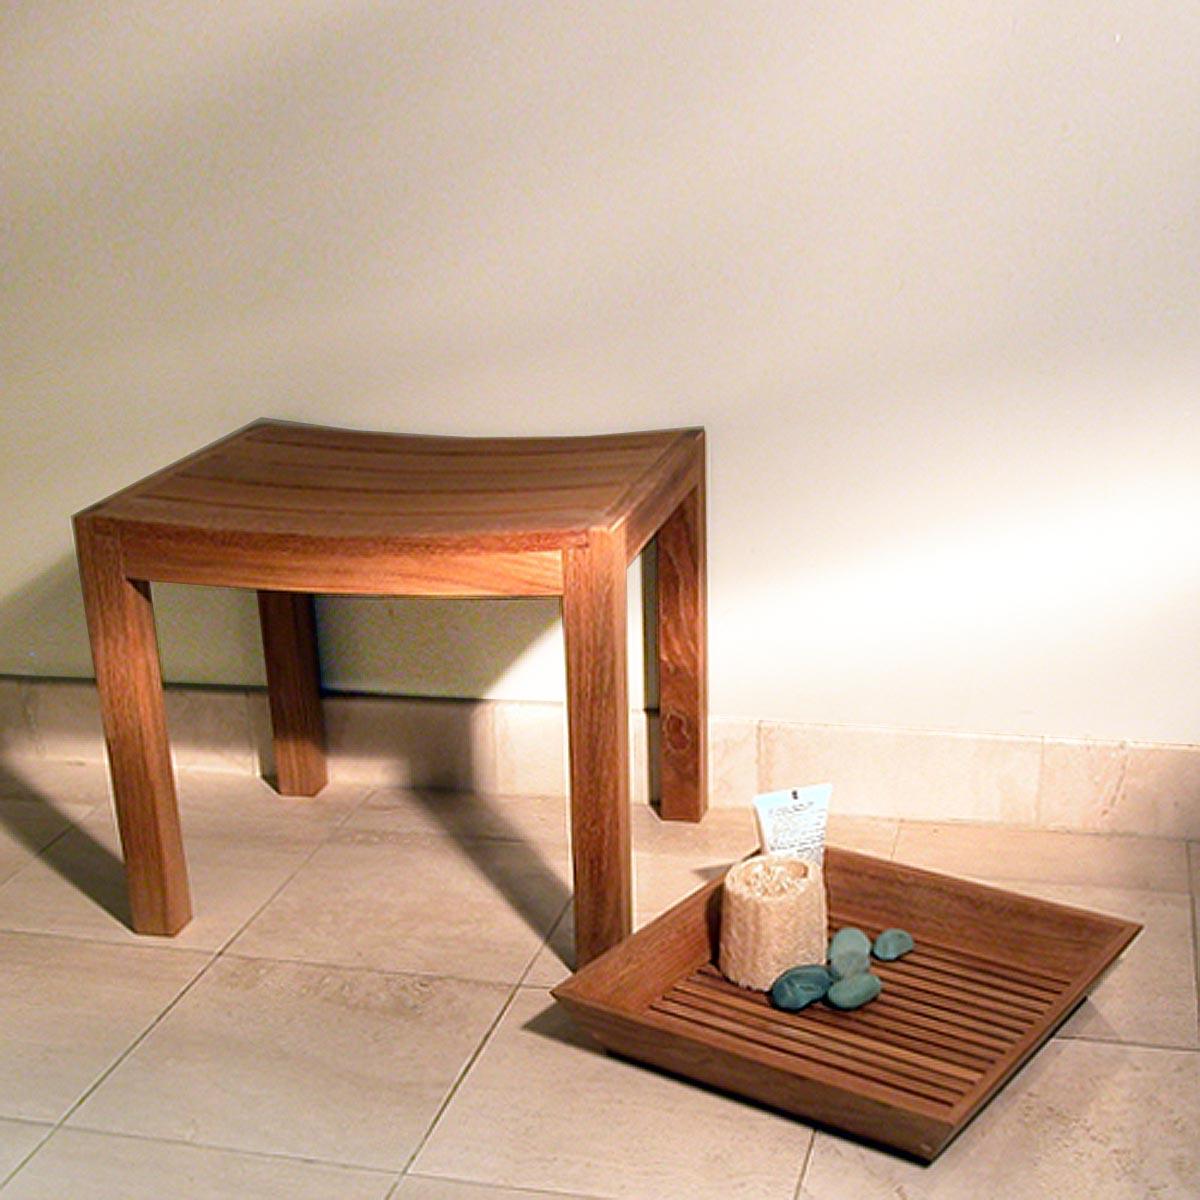 Pacifica Waterproof Teak Spa Curve Stool Westminster  : teak bath stools from www.westminsterteak.com size 1183 x 1168 jpeg 218kB